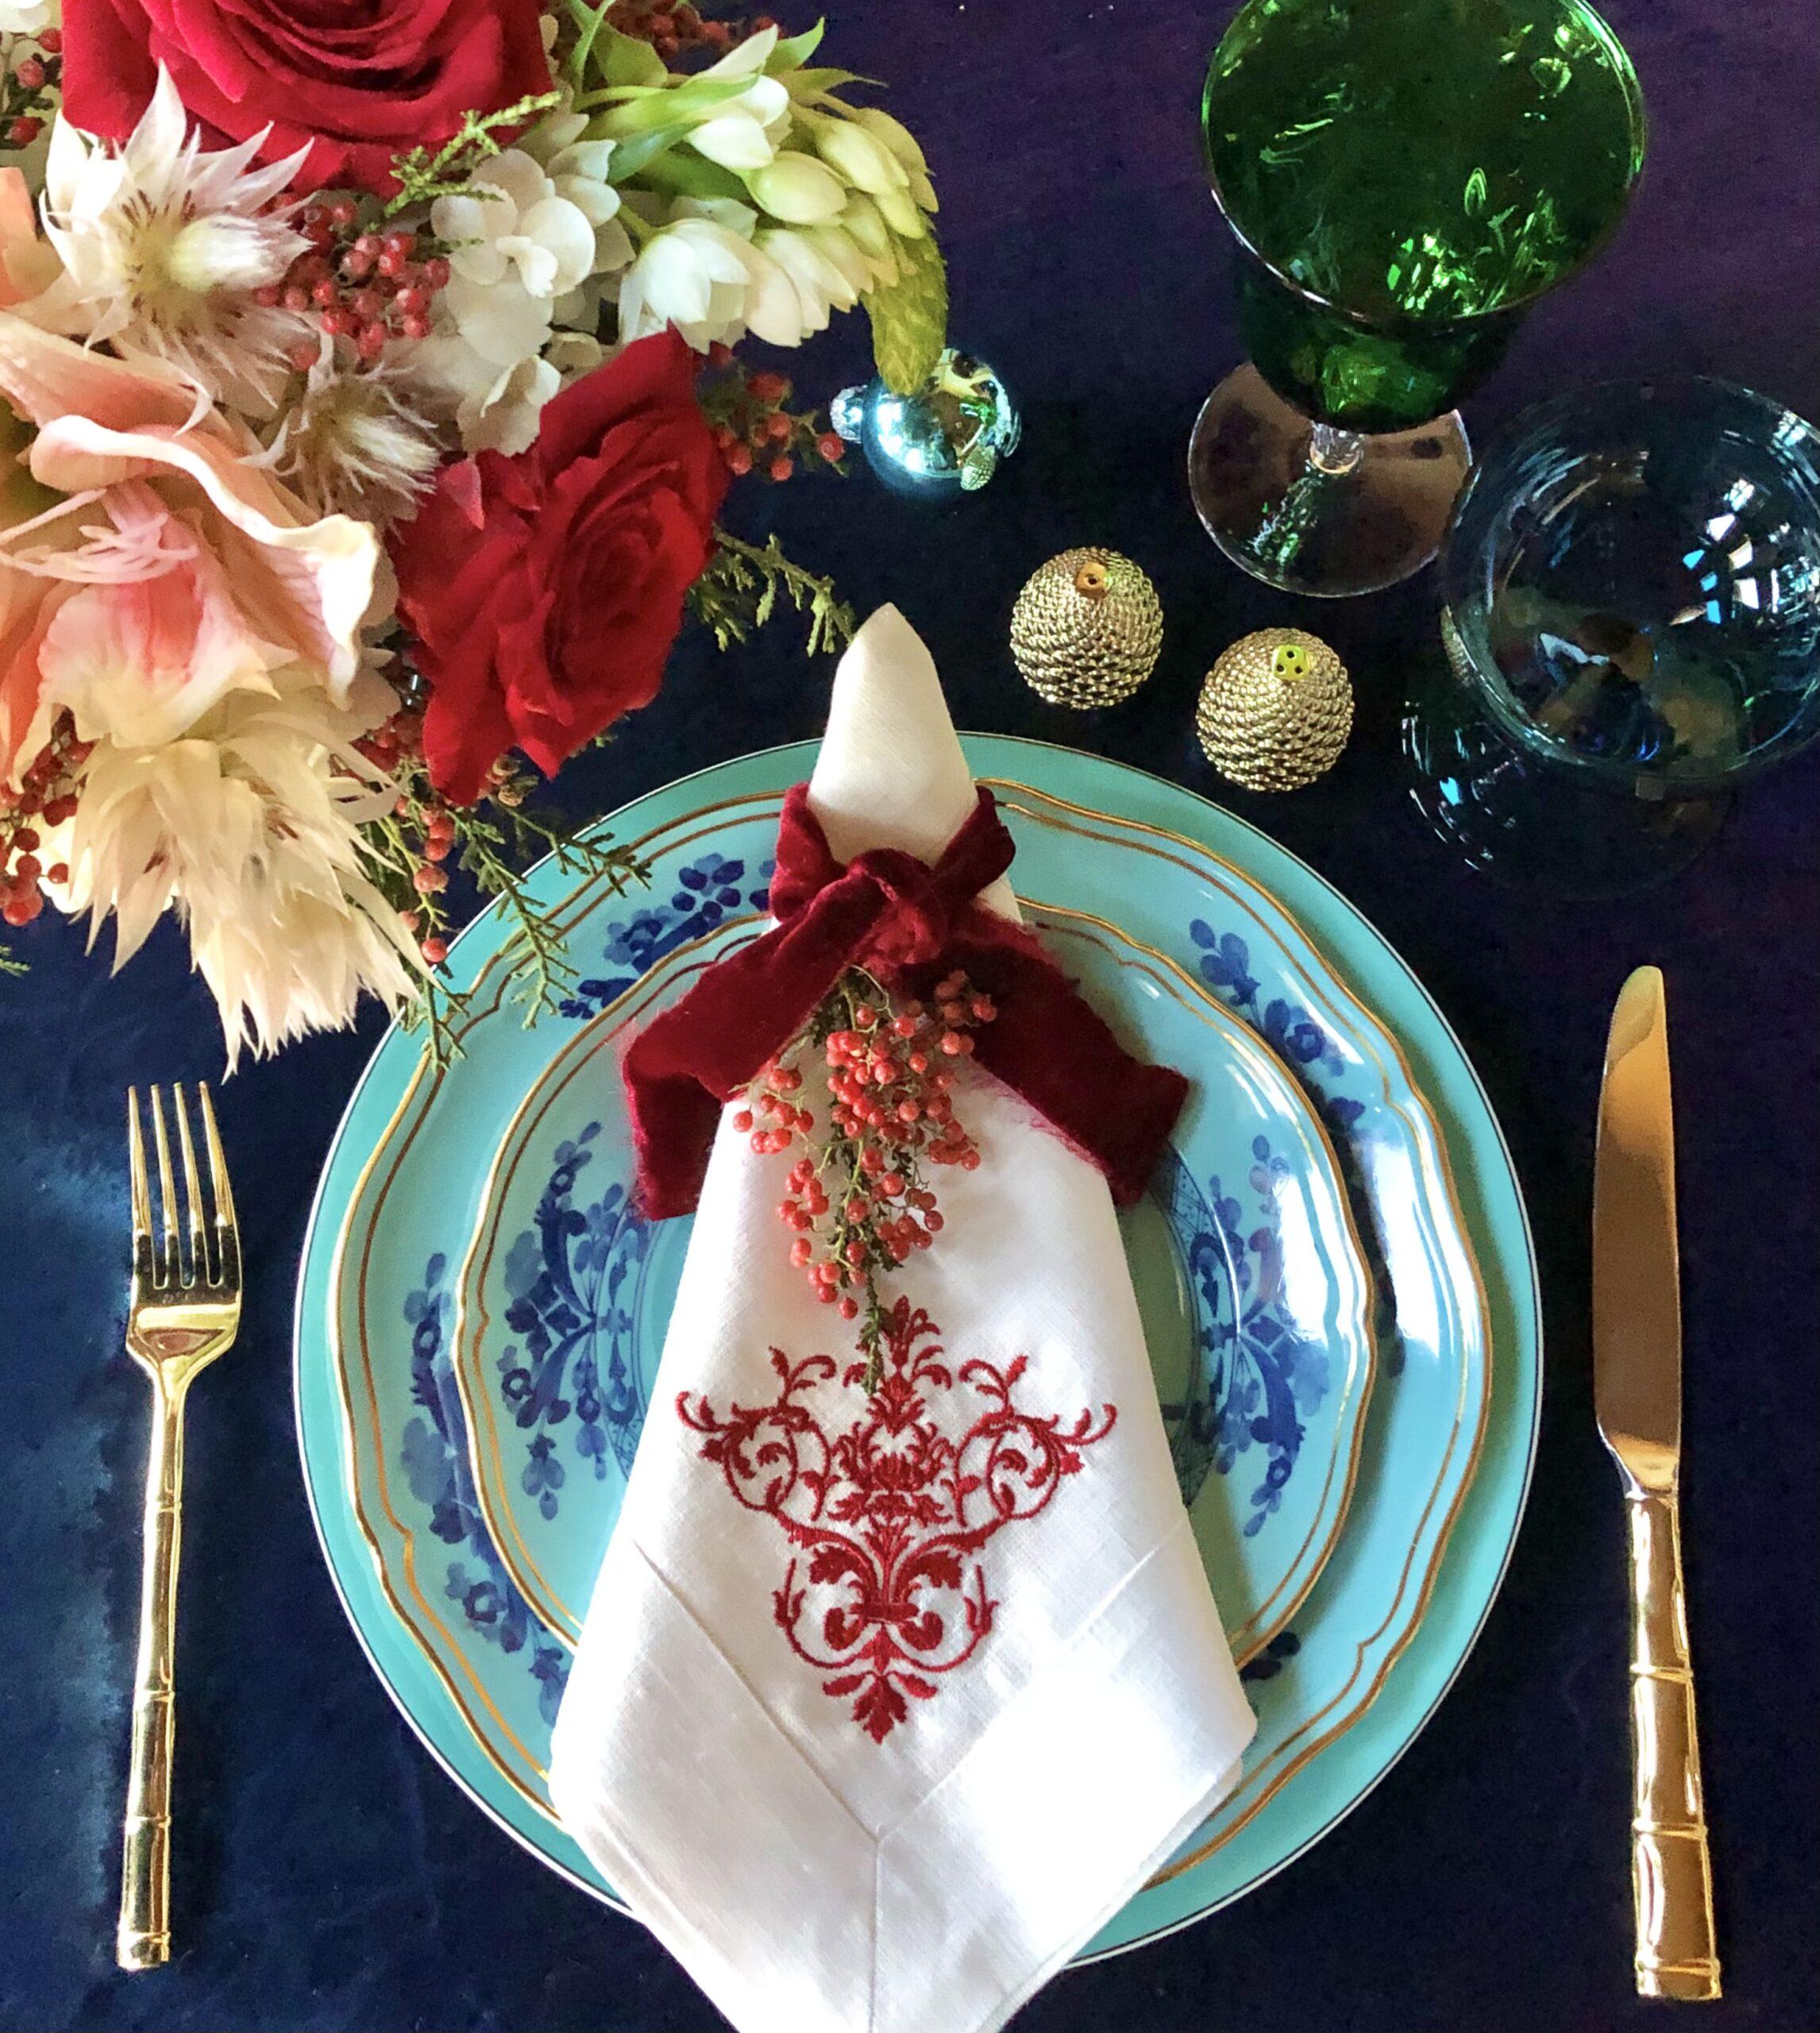 Christmas place setting with Azure Richard Ginori plates and Crown Linen Napk